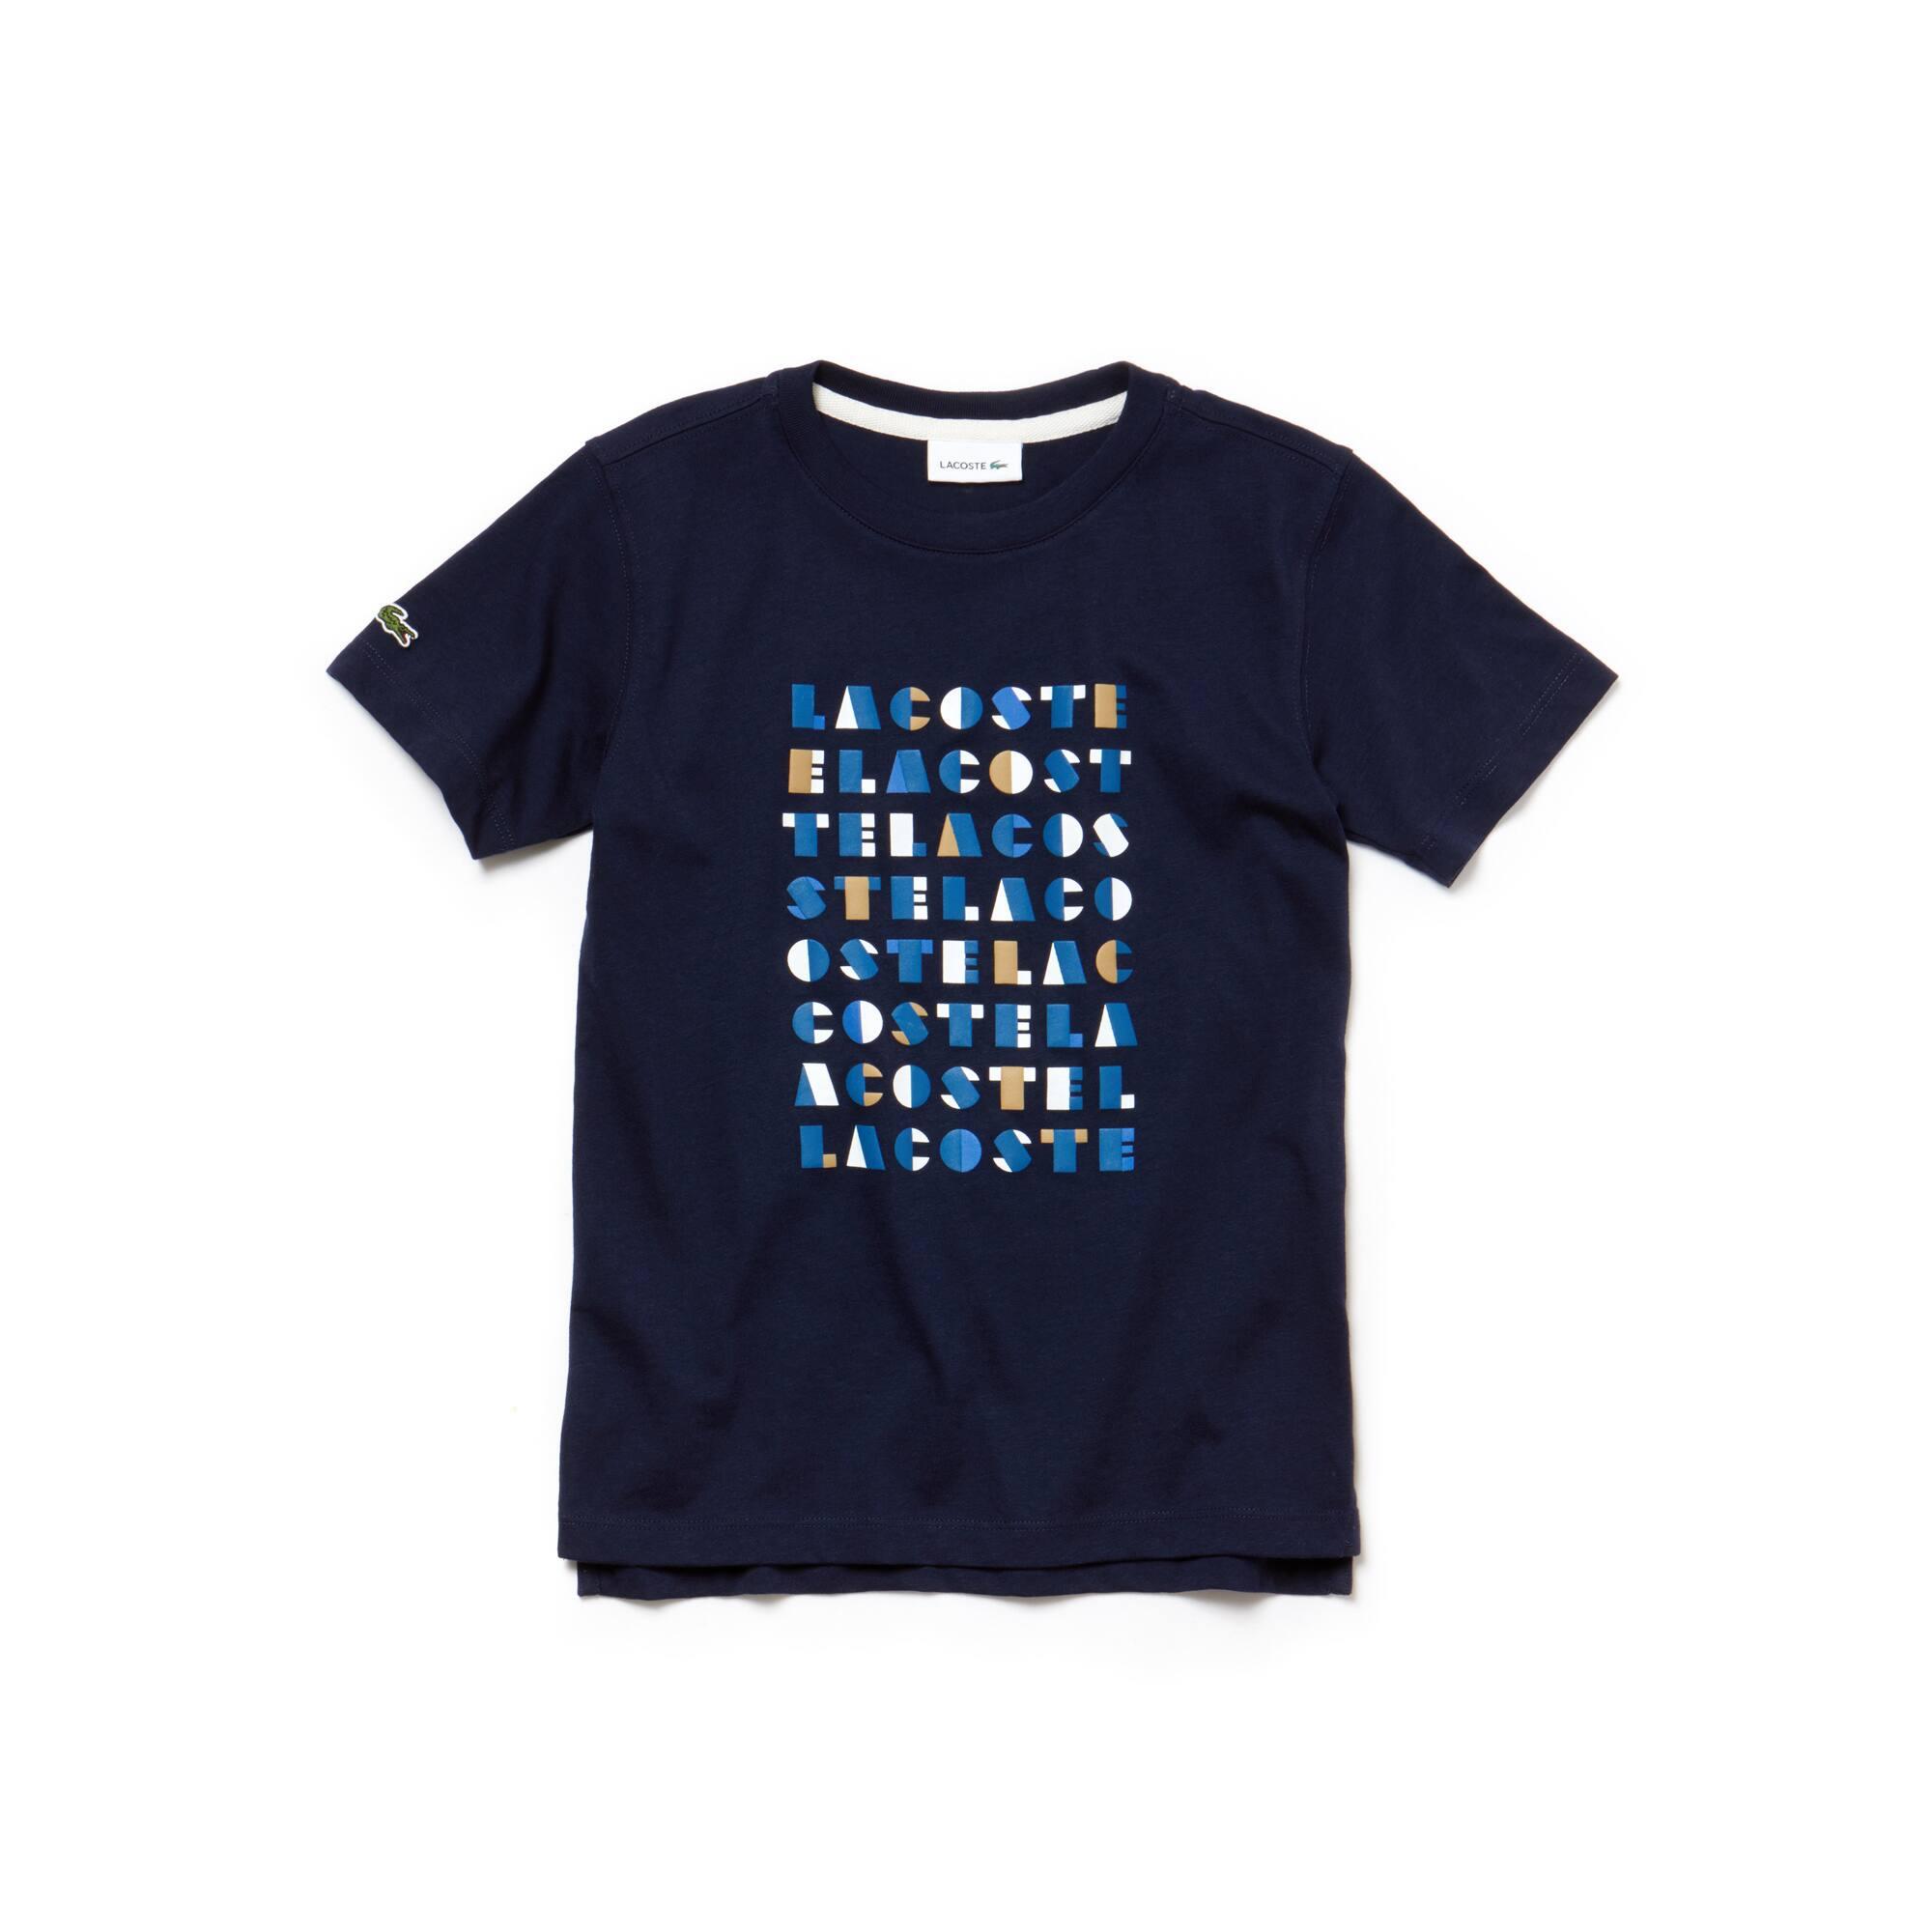 Boys' Crew Neck Graphic Lacoste Lettering Cotton Jersey T-shirt